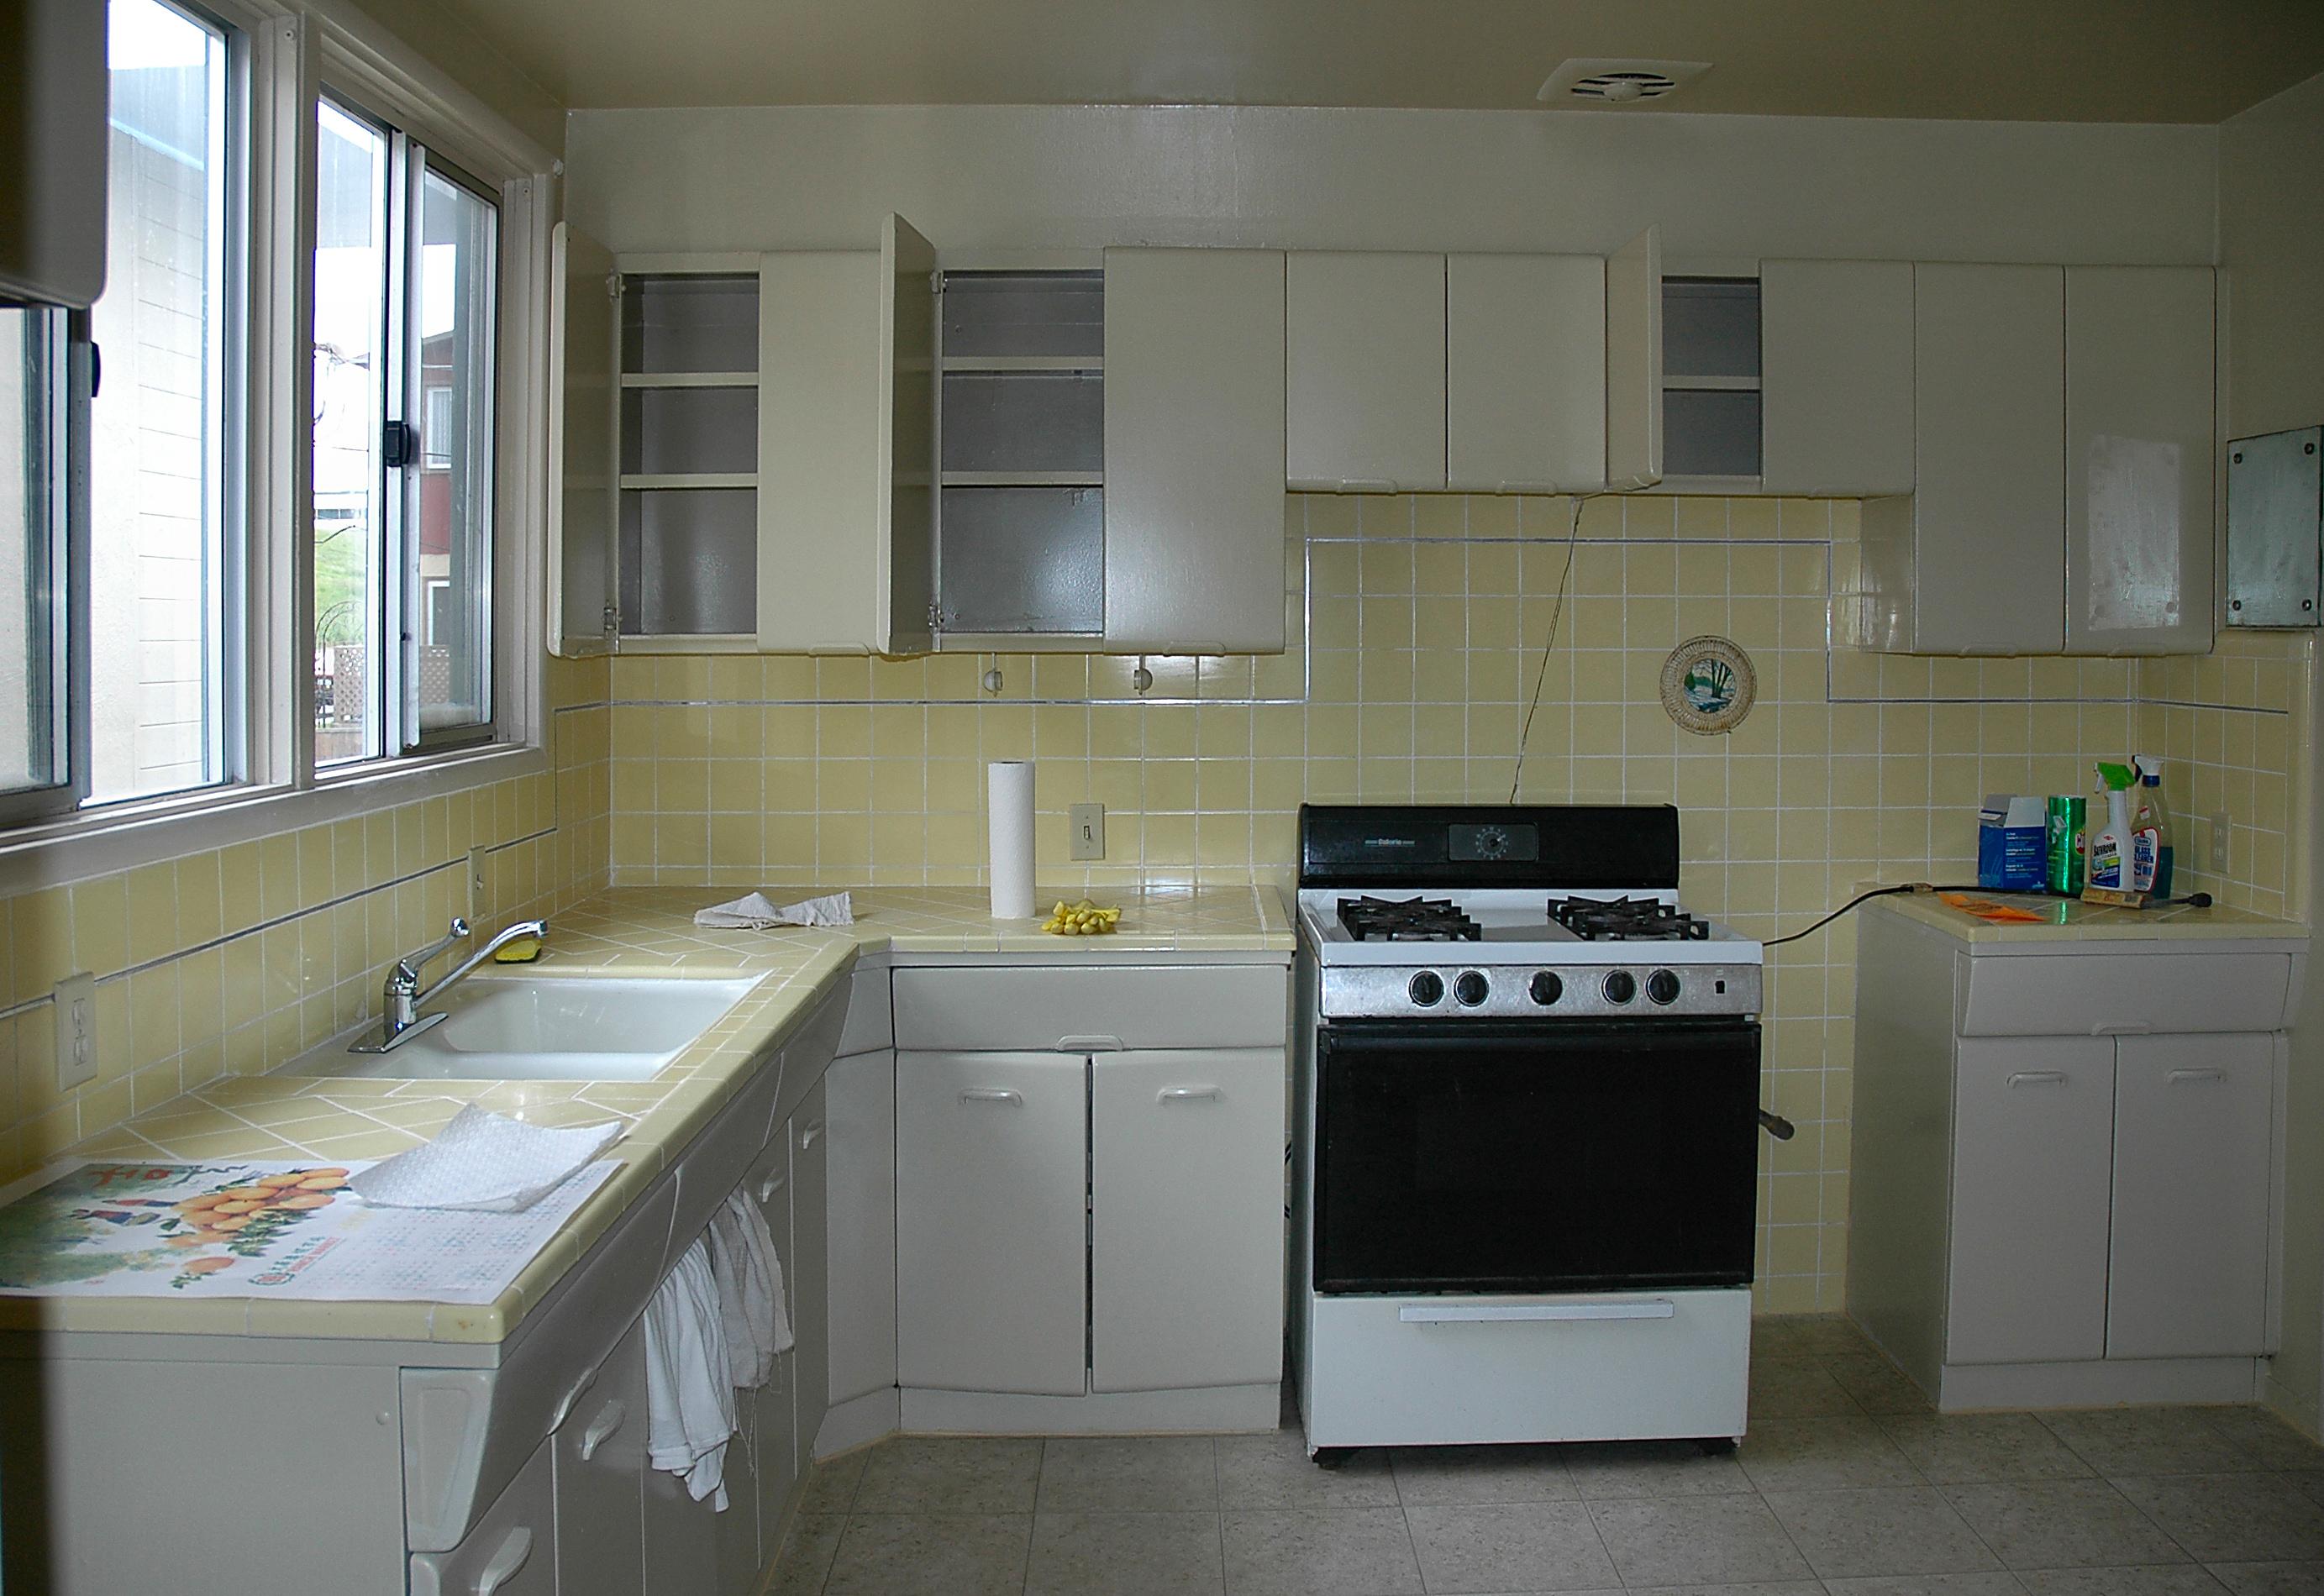 Refurbished Kitchen Cabinets For Sale